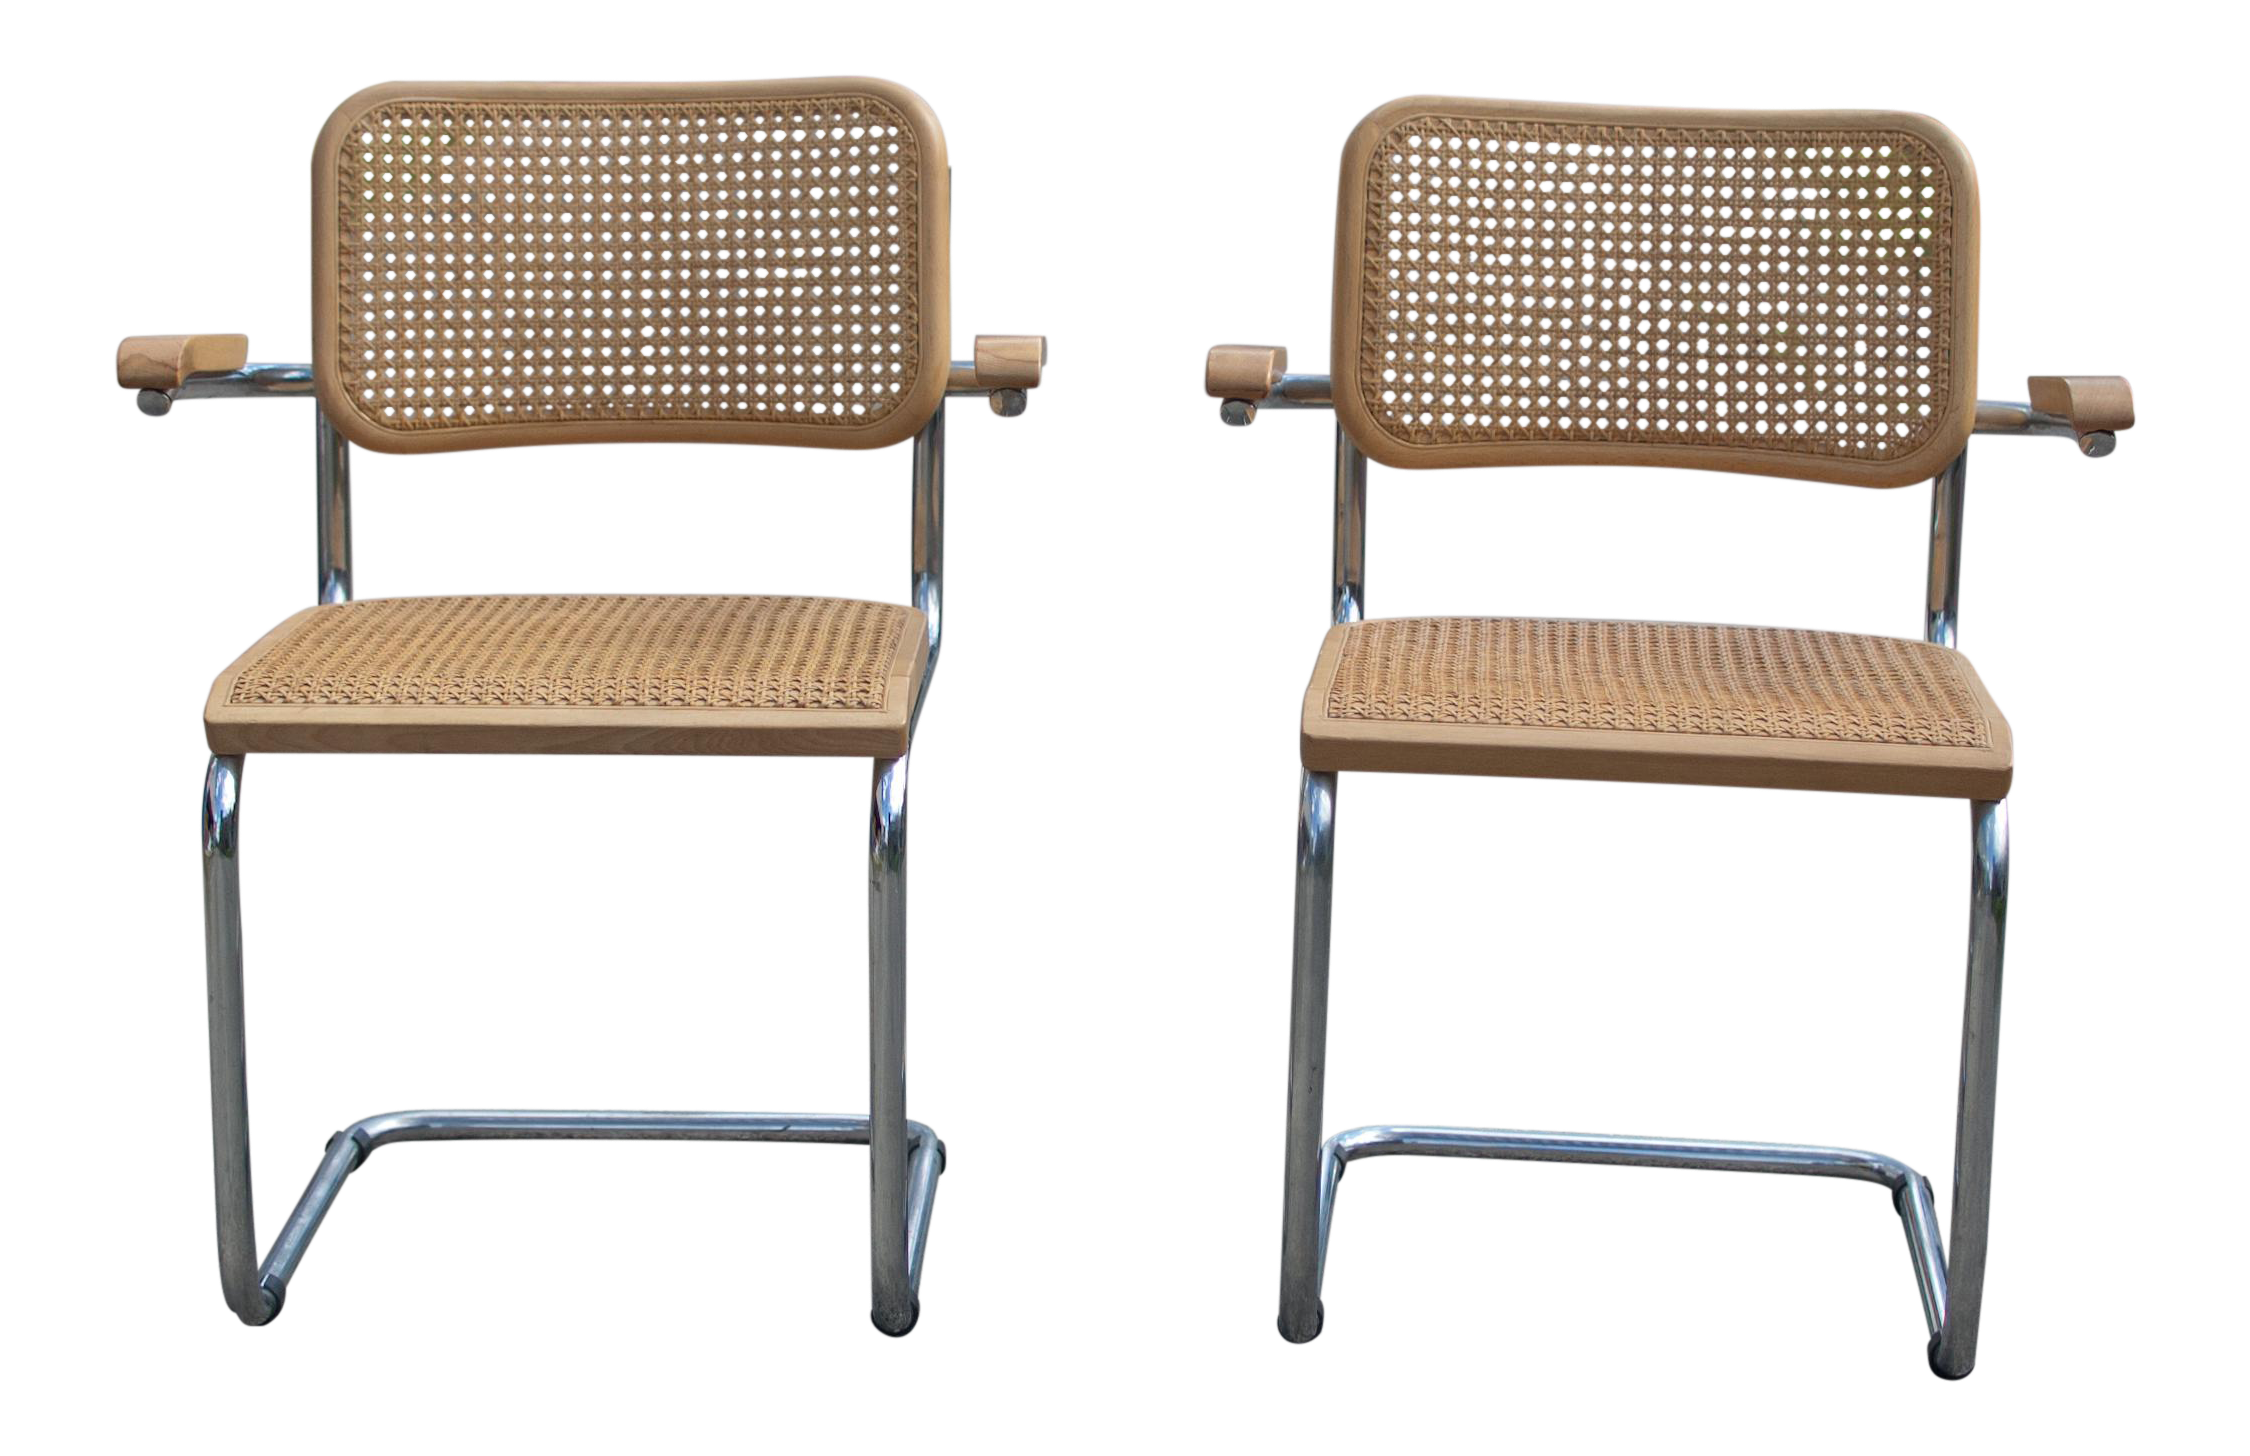 1970s Mid Century Modern Marcel Breuer Cesca Arm Chairs   A Pair